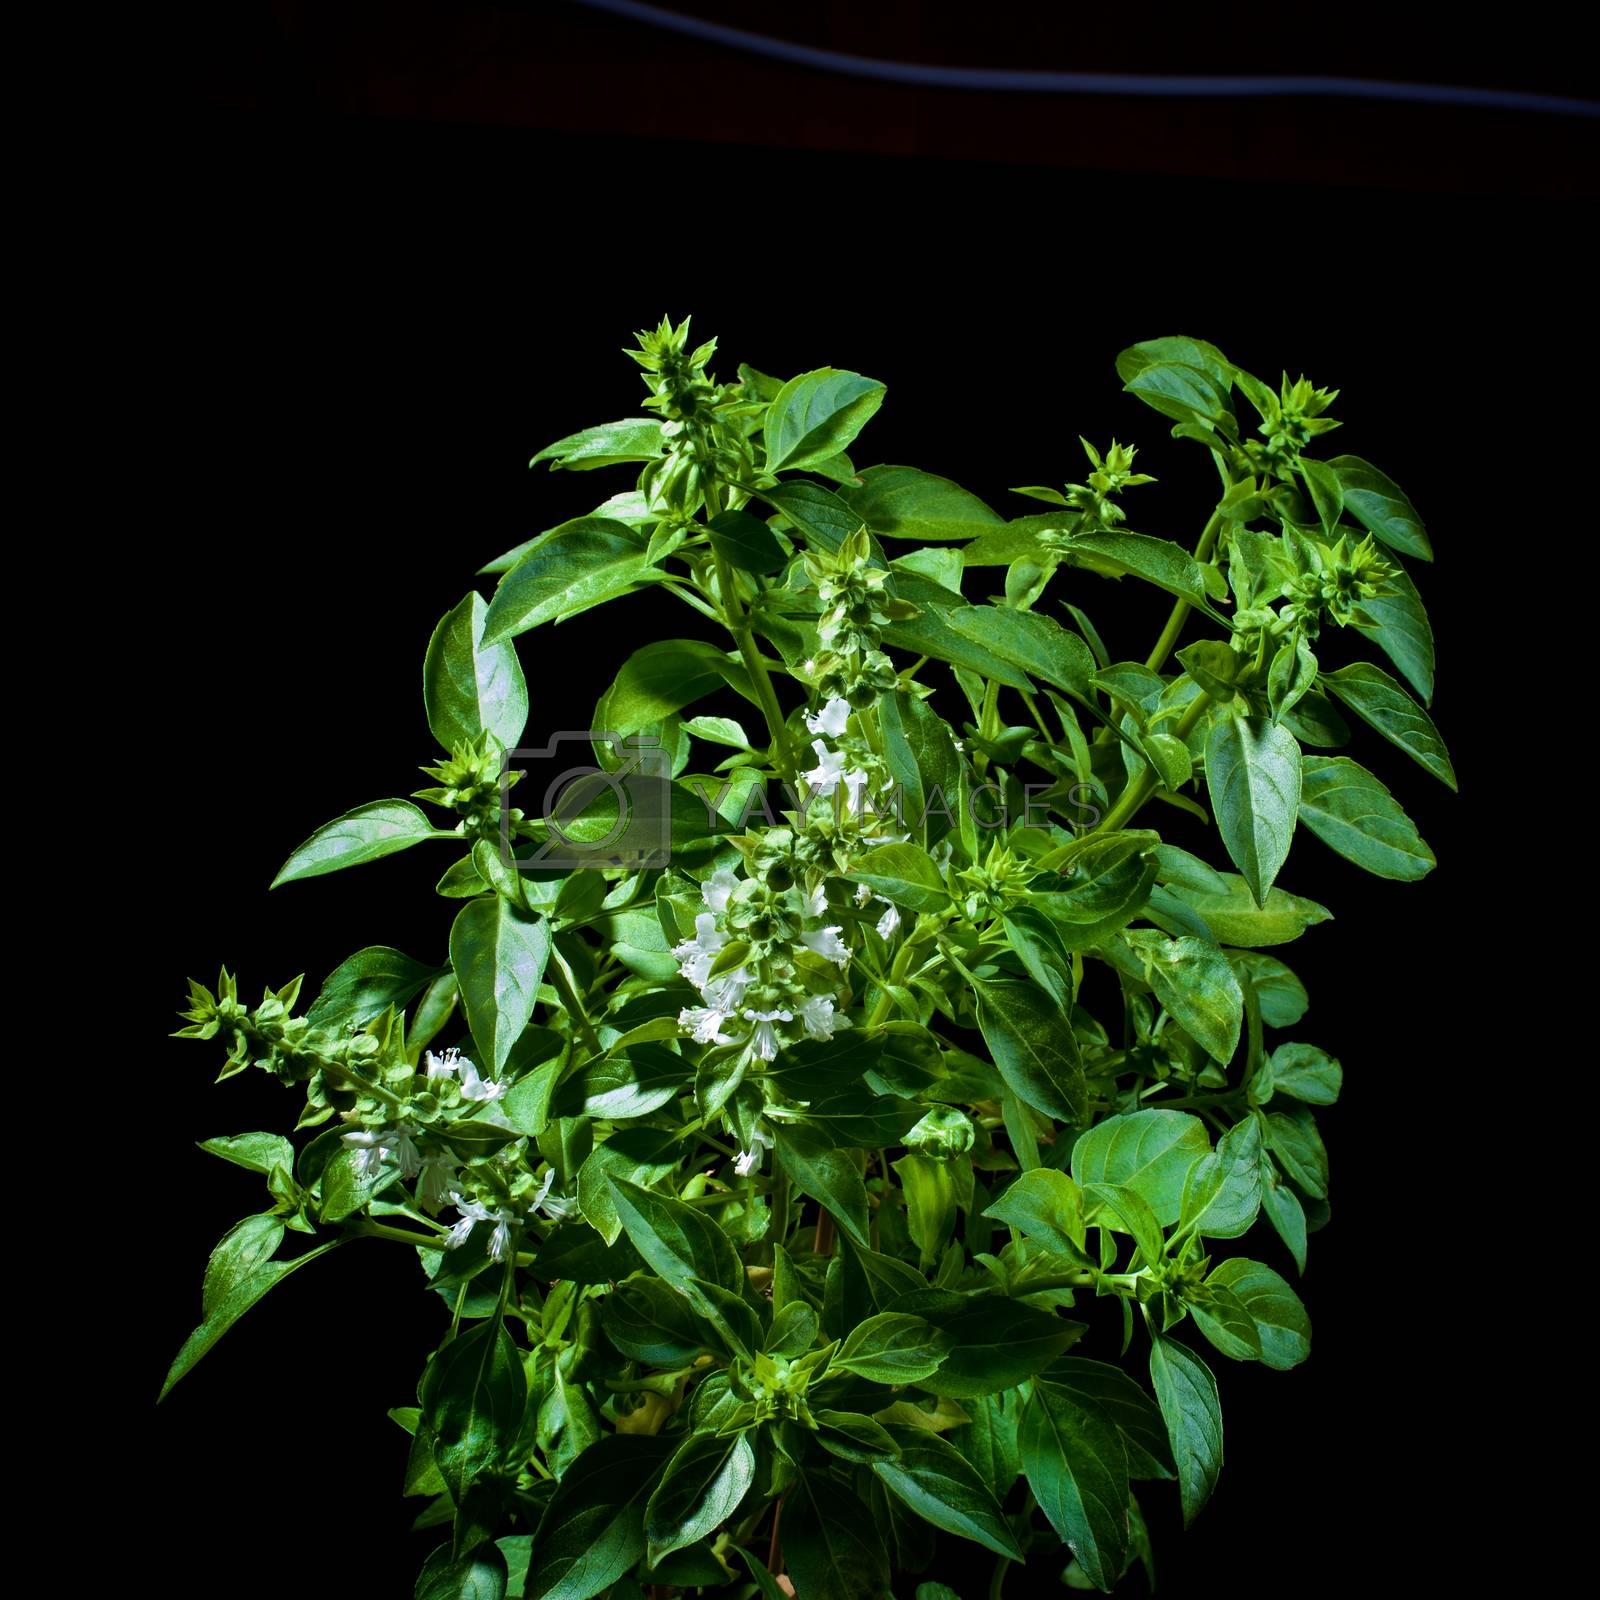 Fresh Blooming Green Lush Foliage Basil isolated on Black background